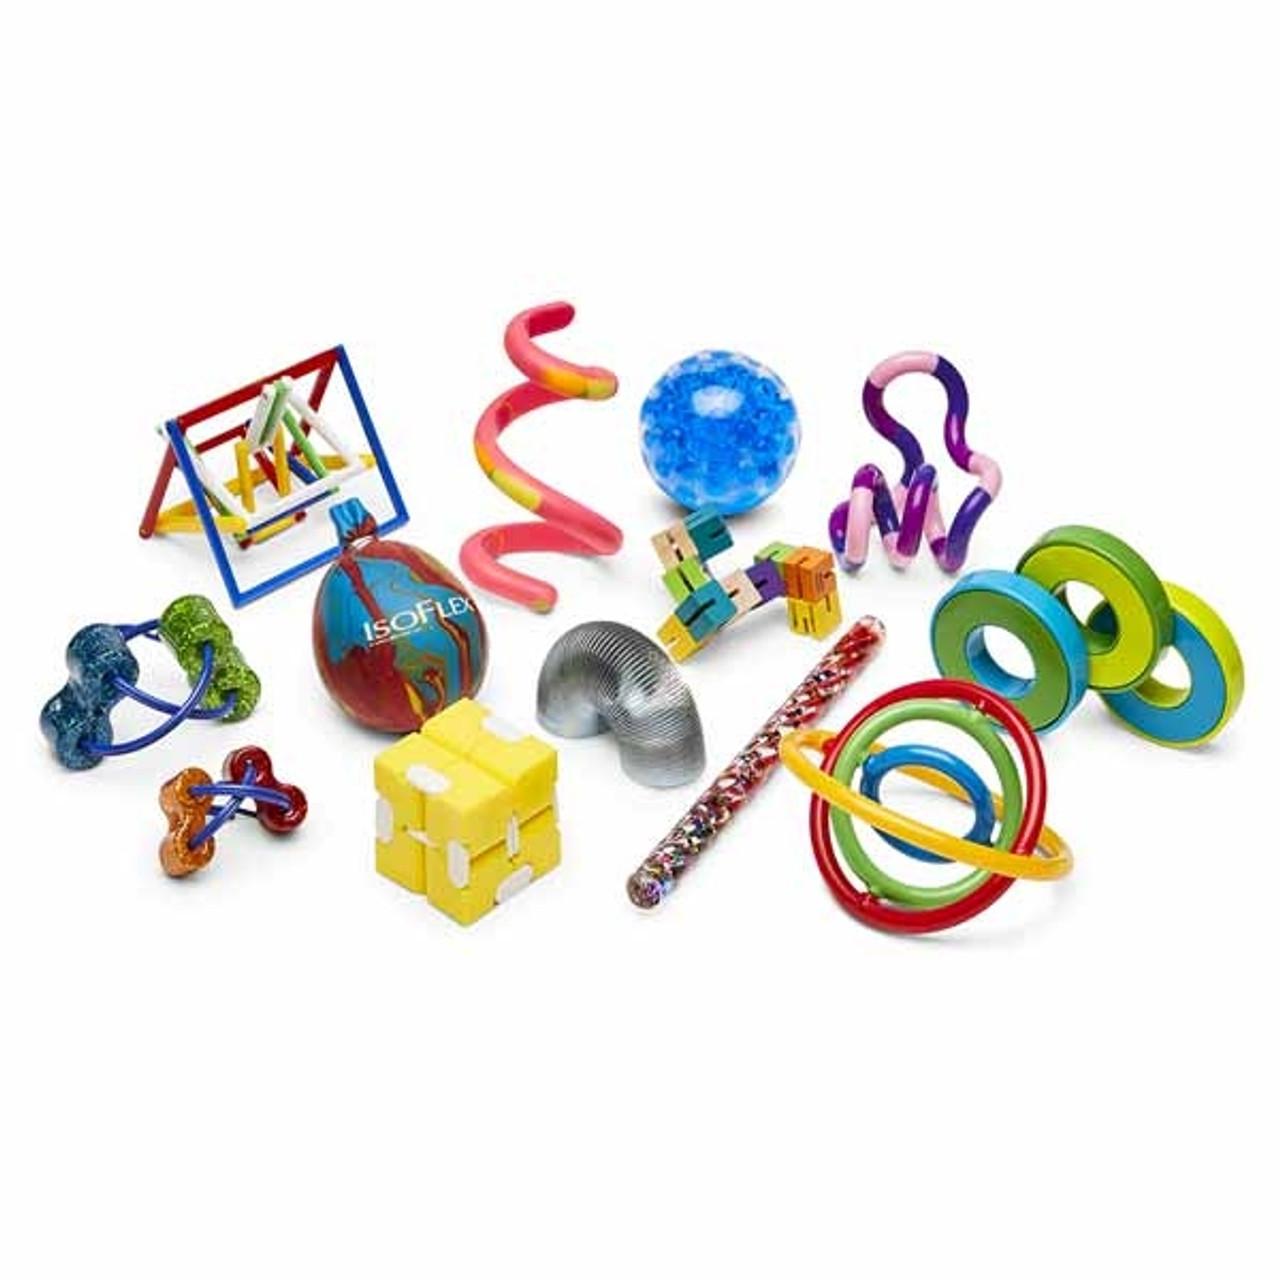 Basic Fiddle Set -- 13 fidget toys